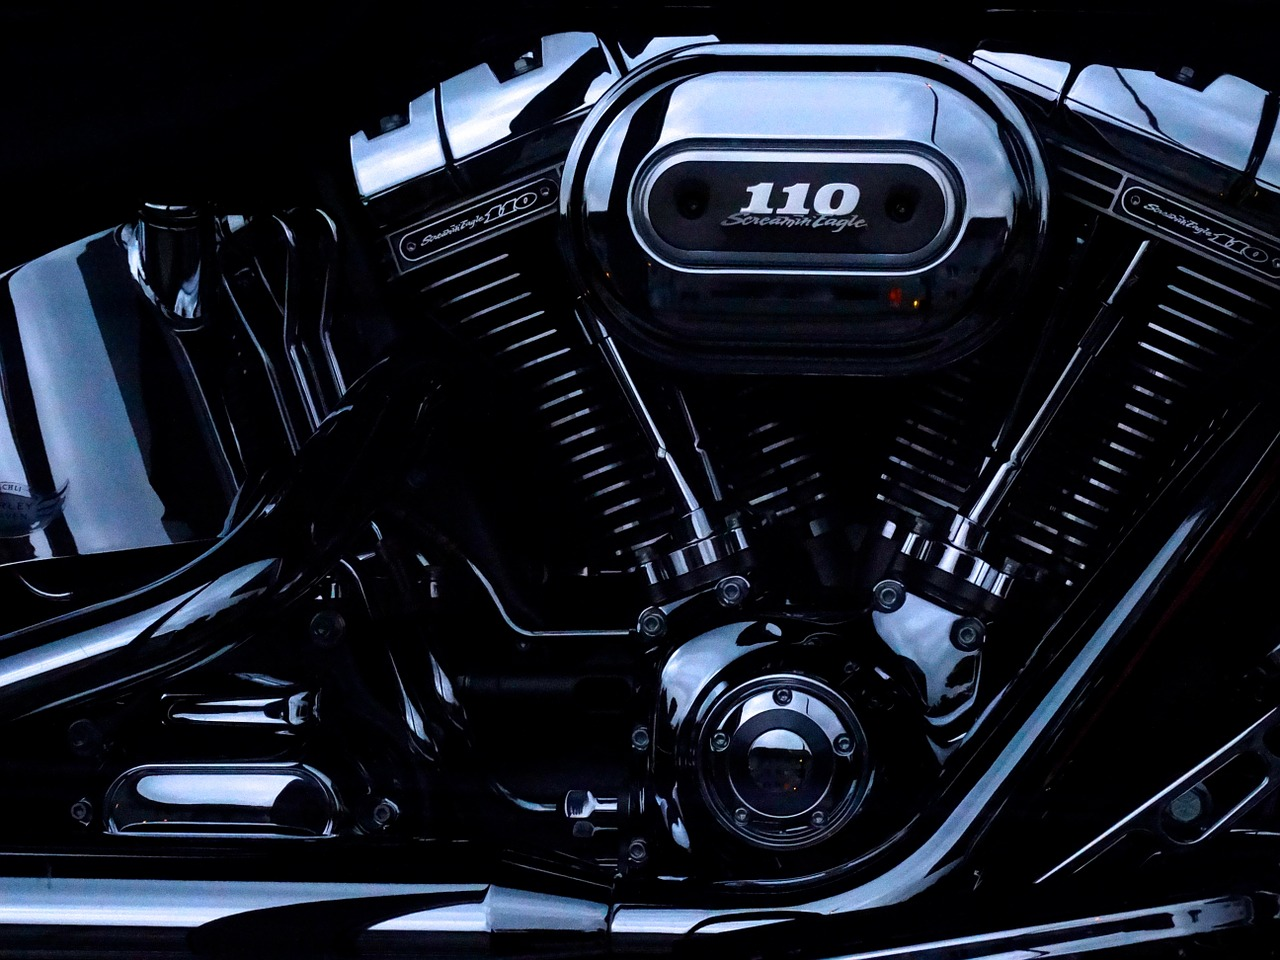 Screamin eagle de Harley Davidson